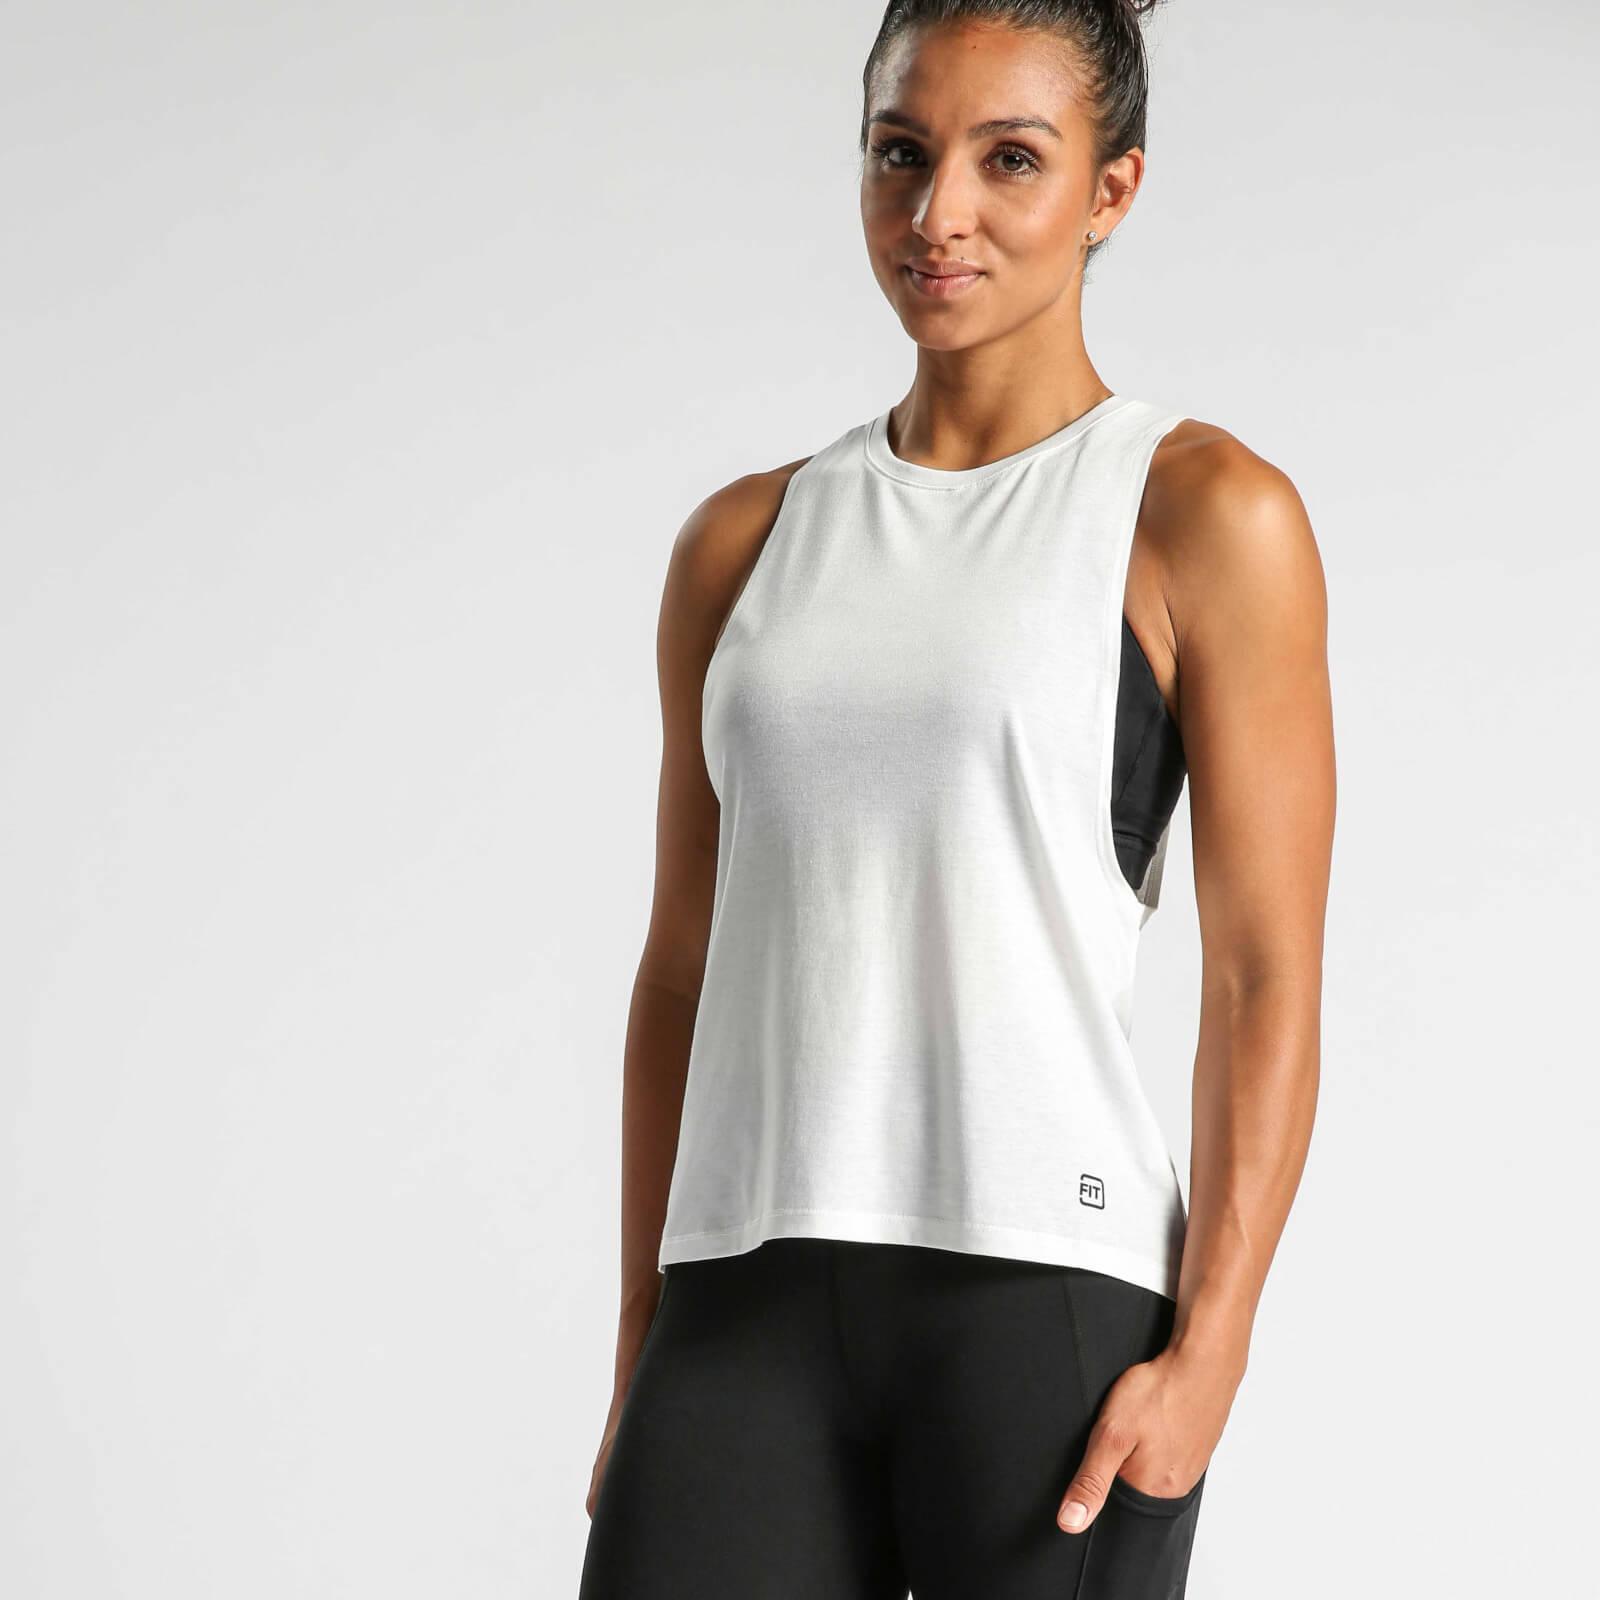 IdealFit Muscle Tank - White - L - White